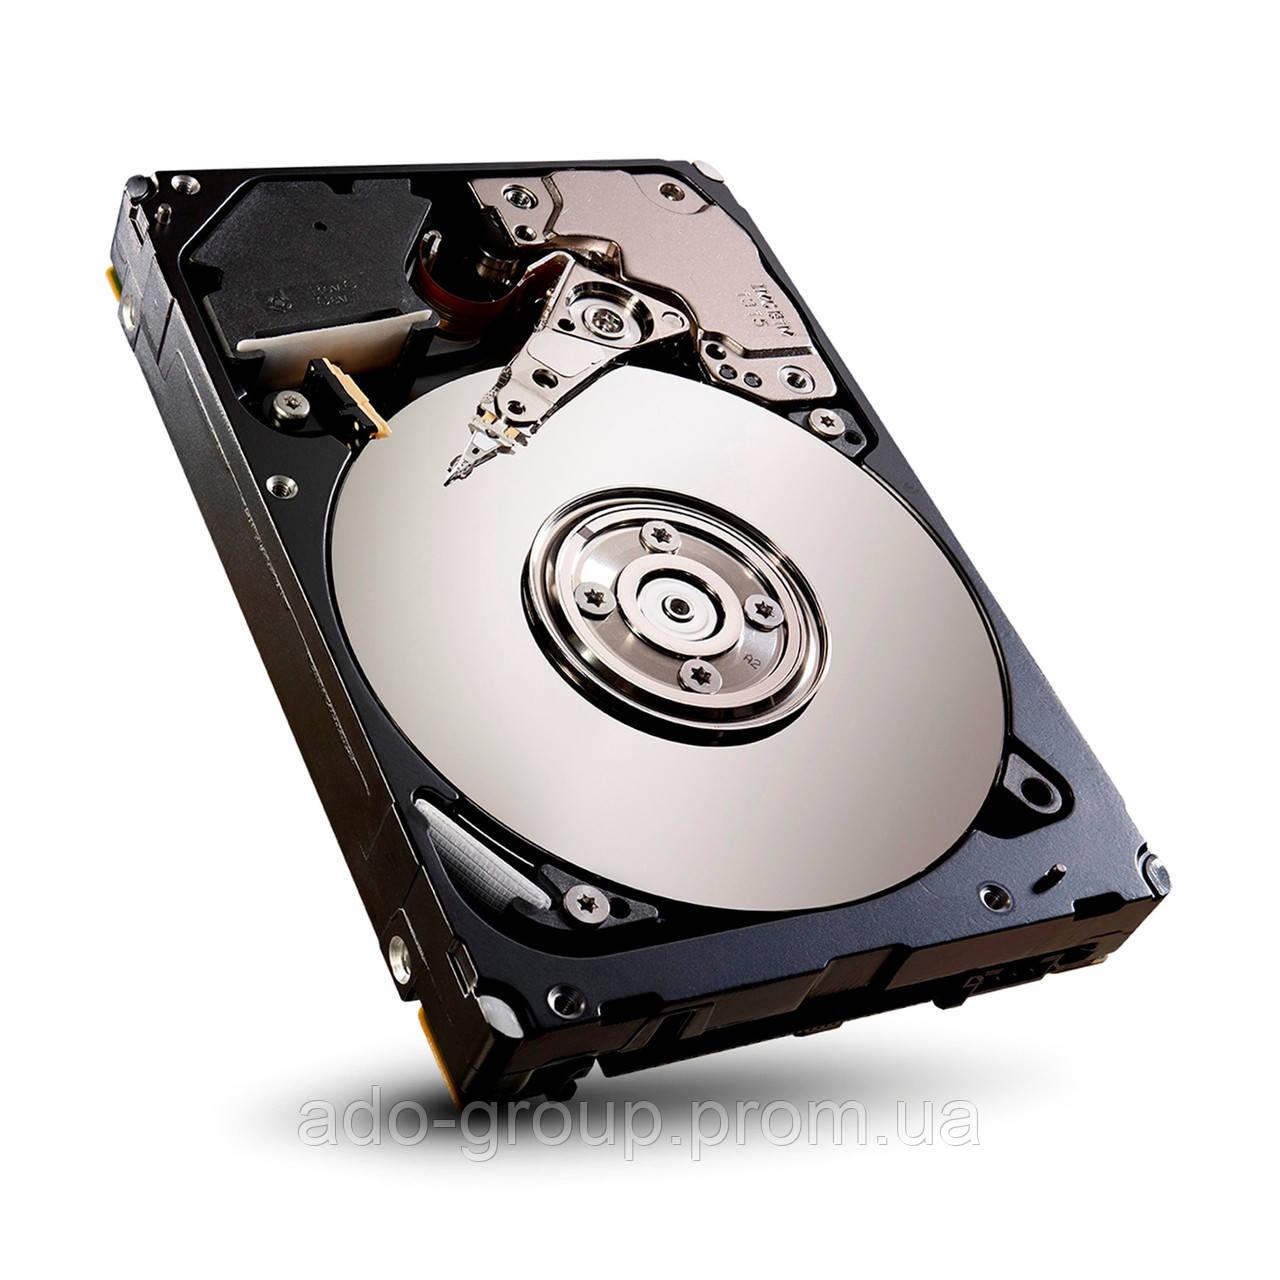 "MBF2300RC Жесткий диск Fujitsu 300Gb SAS 10K  2.5"" +"